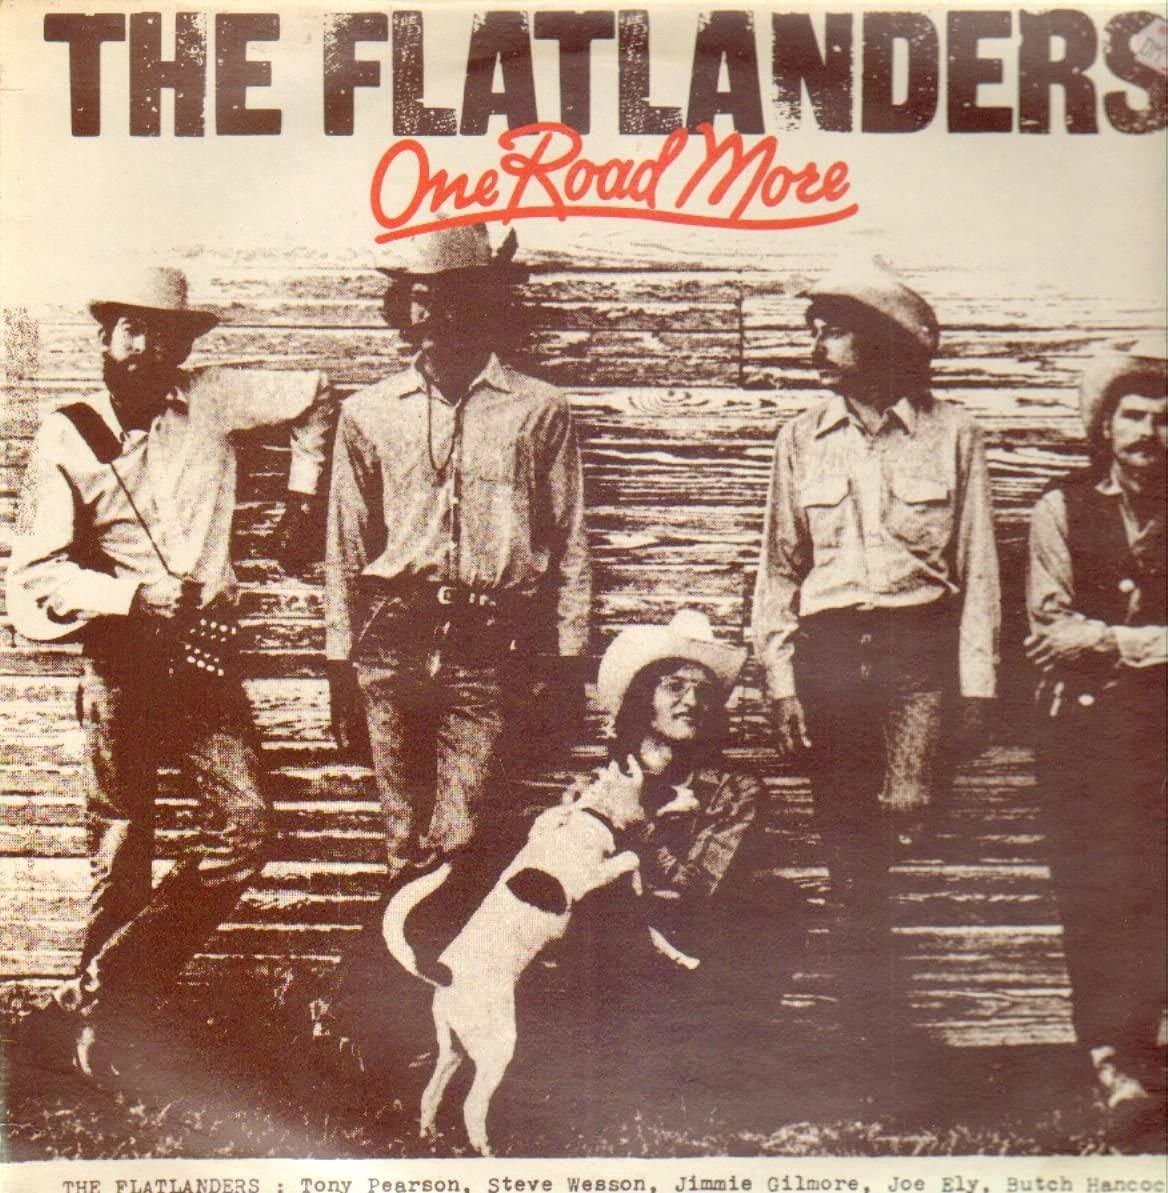 The Flatlanders – One Road More cover album